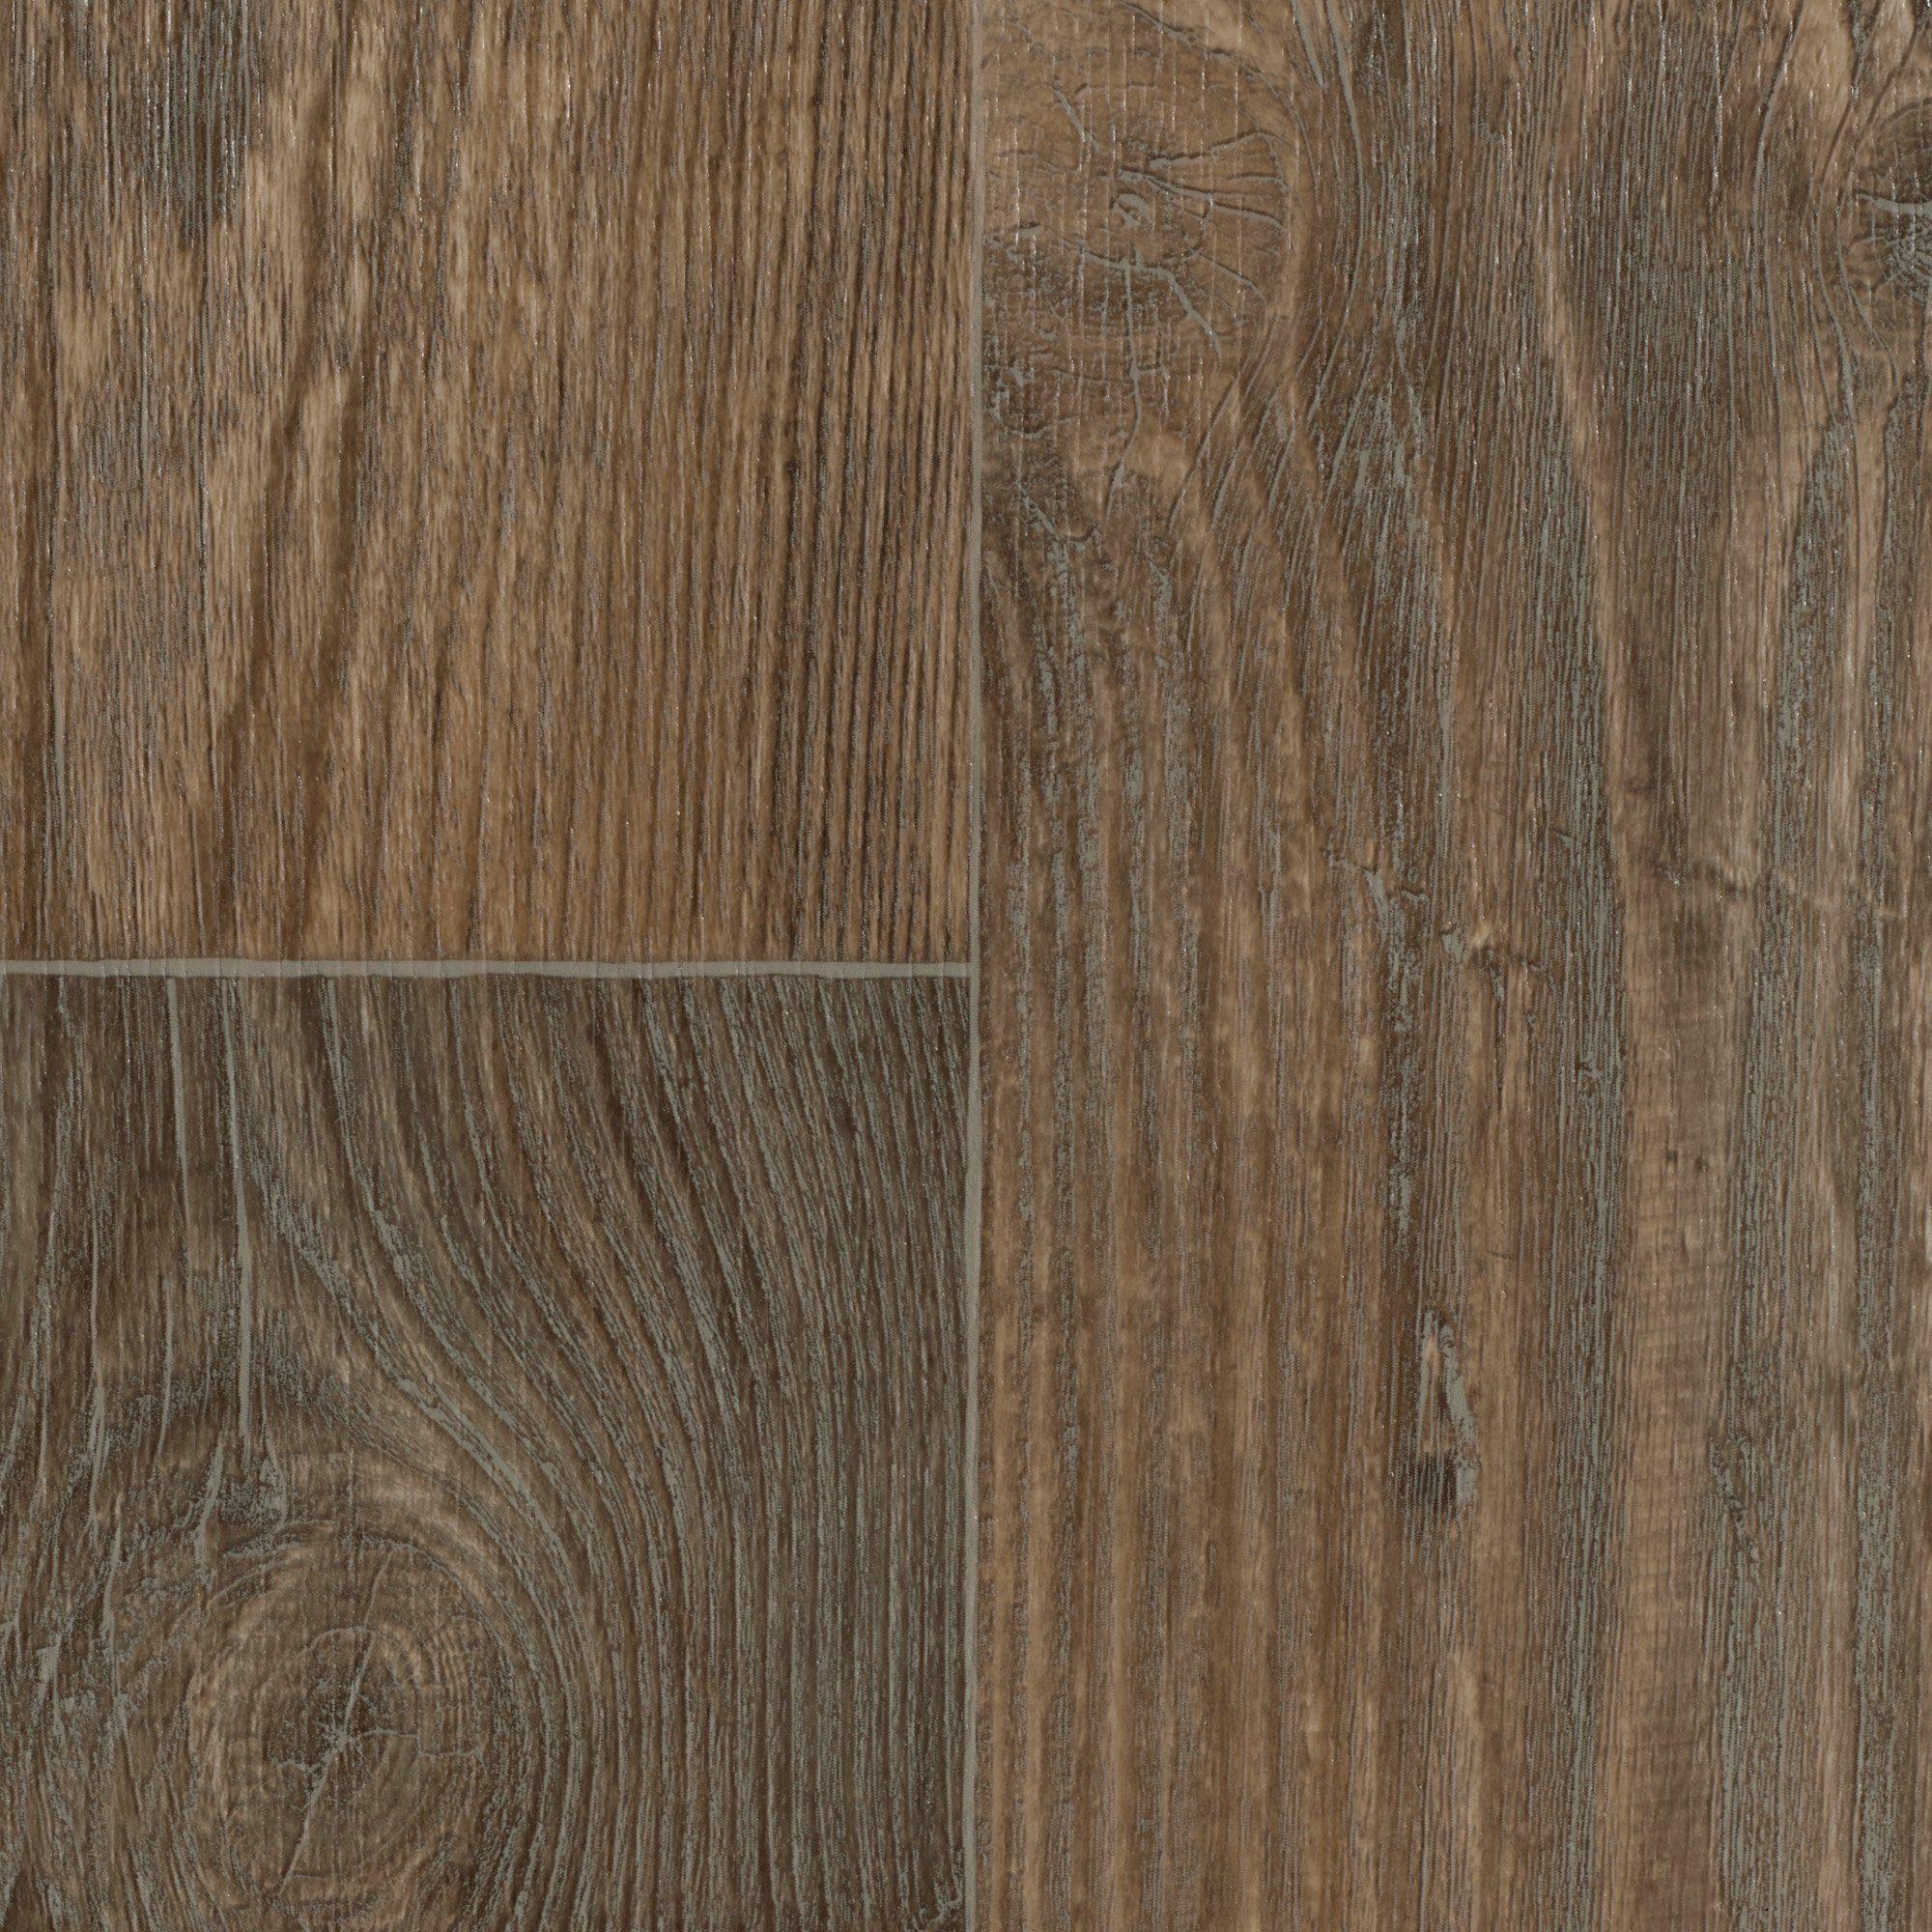 BODENMEISTER Vinylboden »Dielenoptik Pinie rustikal«, Meterware in 400 cm Breite